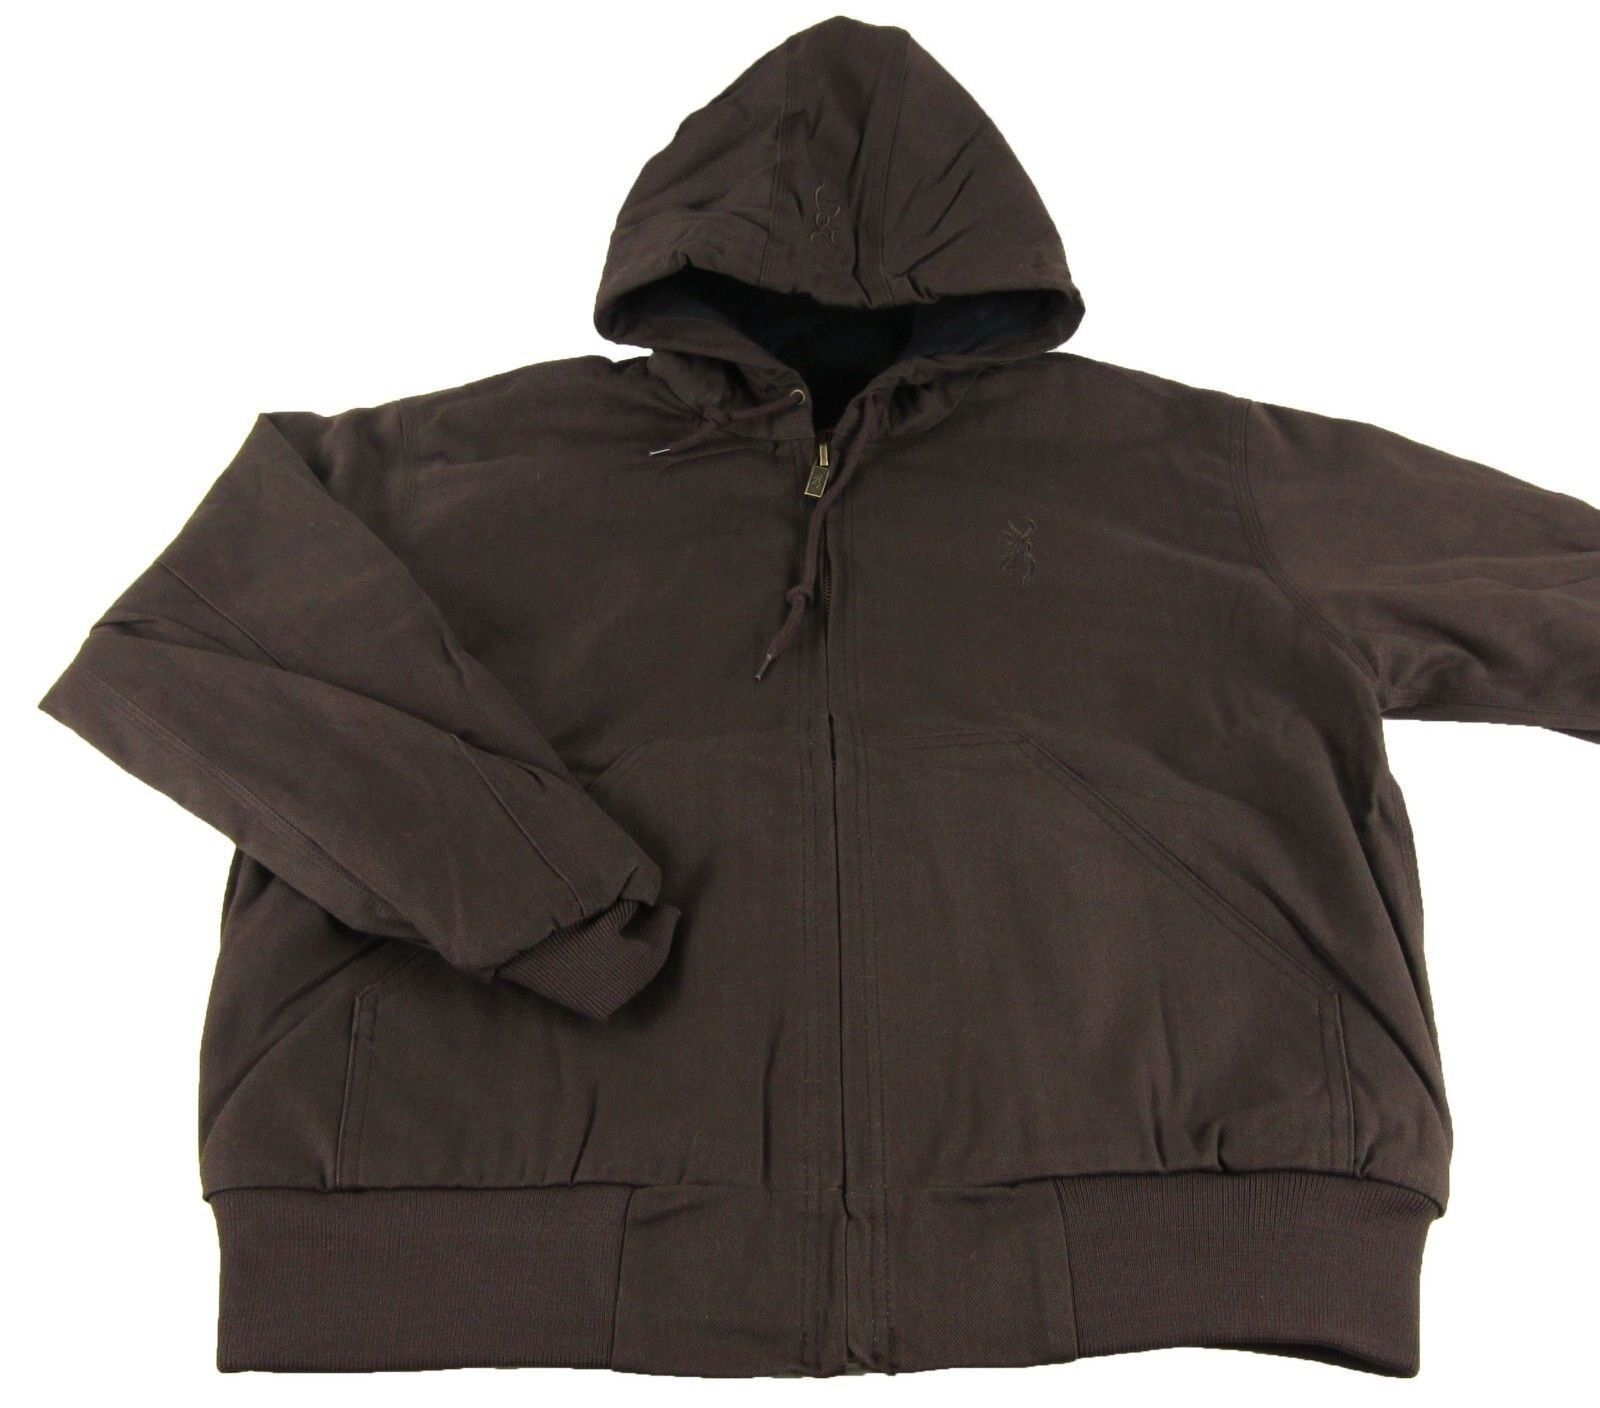 Mens NWT brauning Buckmark Hooded Cotton Canvas braun Jacket Größe M XL 2XL